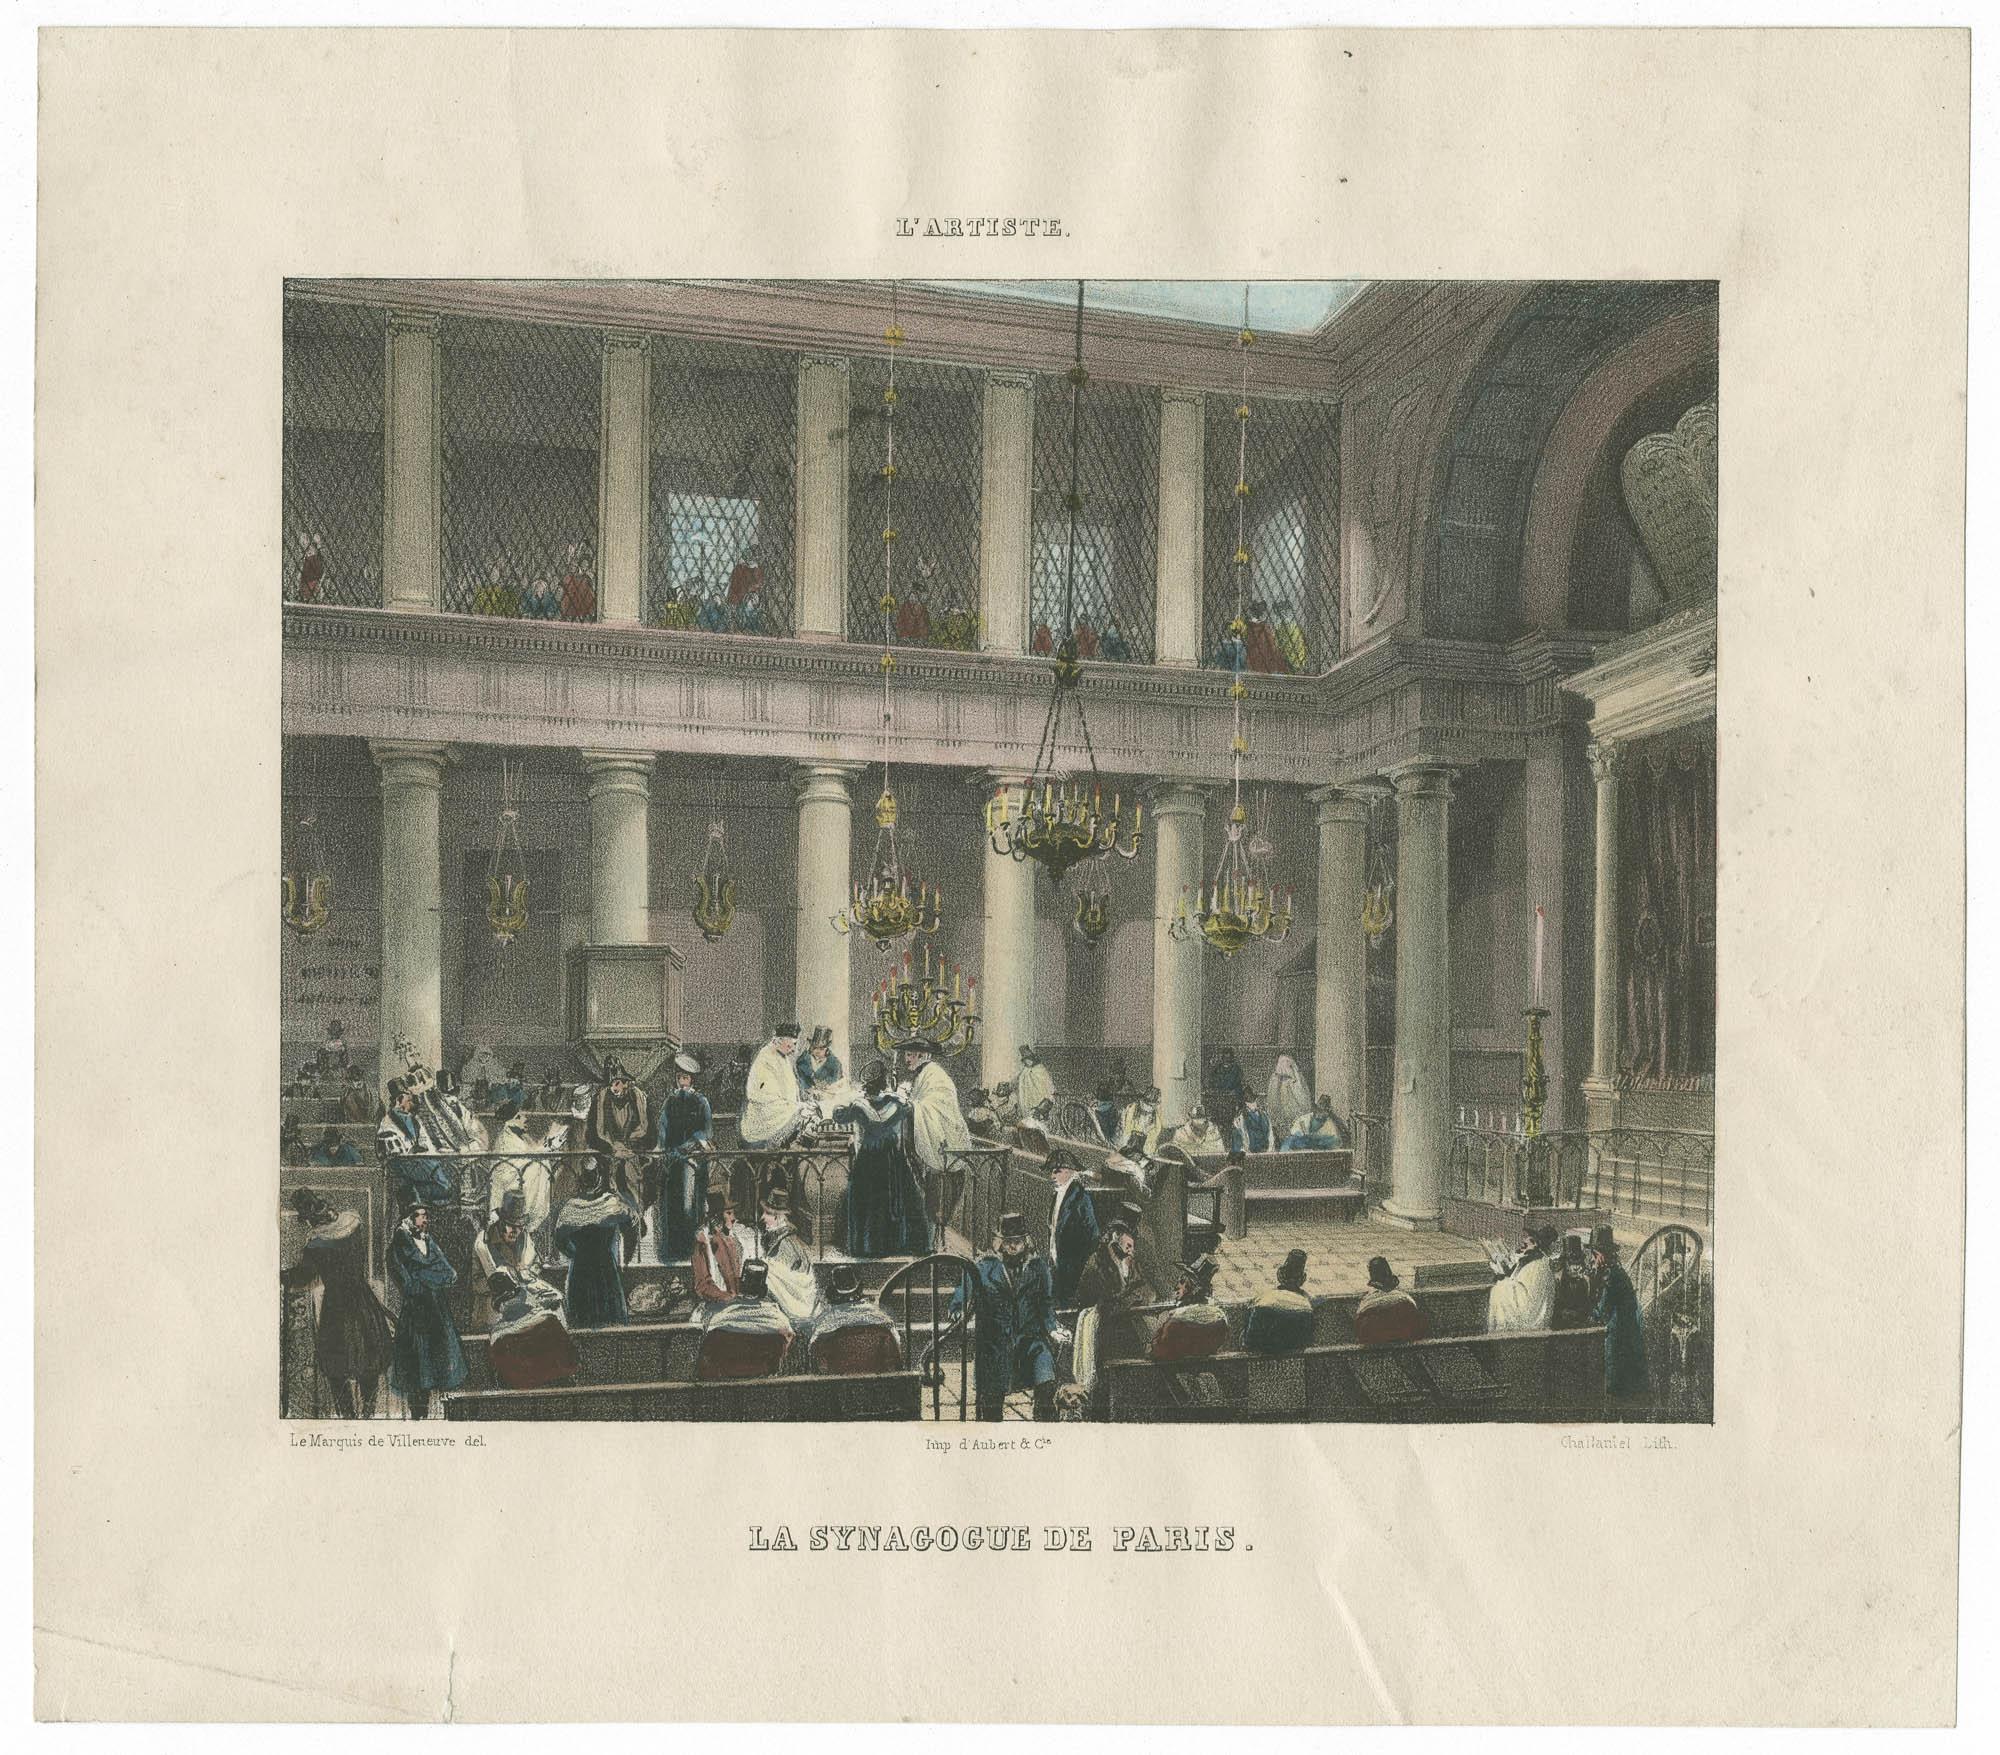 La Synagogue de Paris